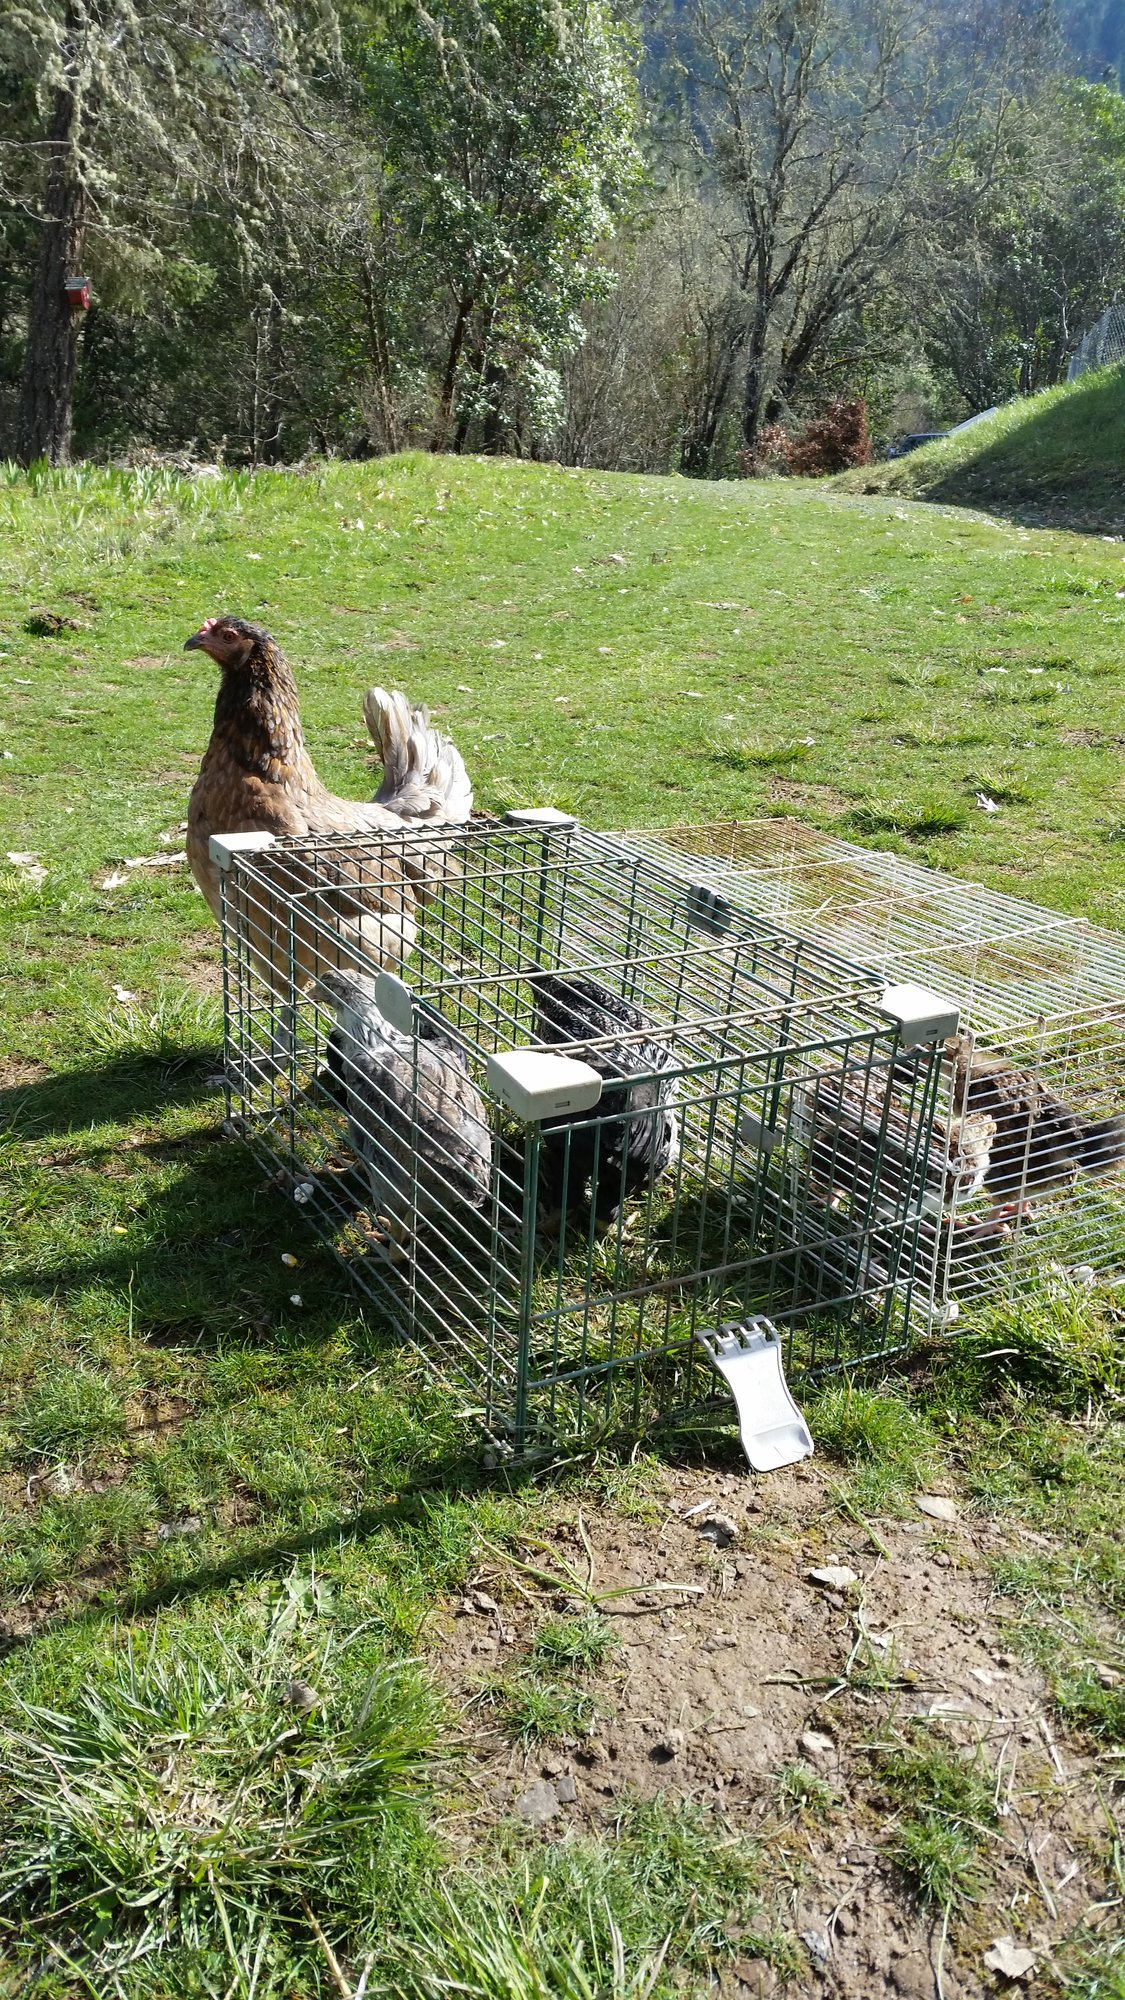 broody,her chicks, grange chicks sunning.jpg